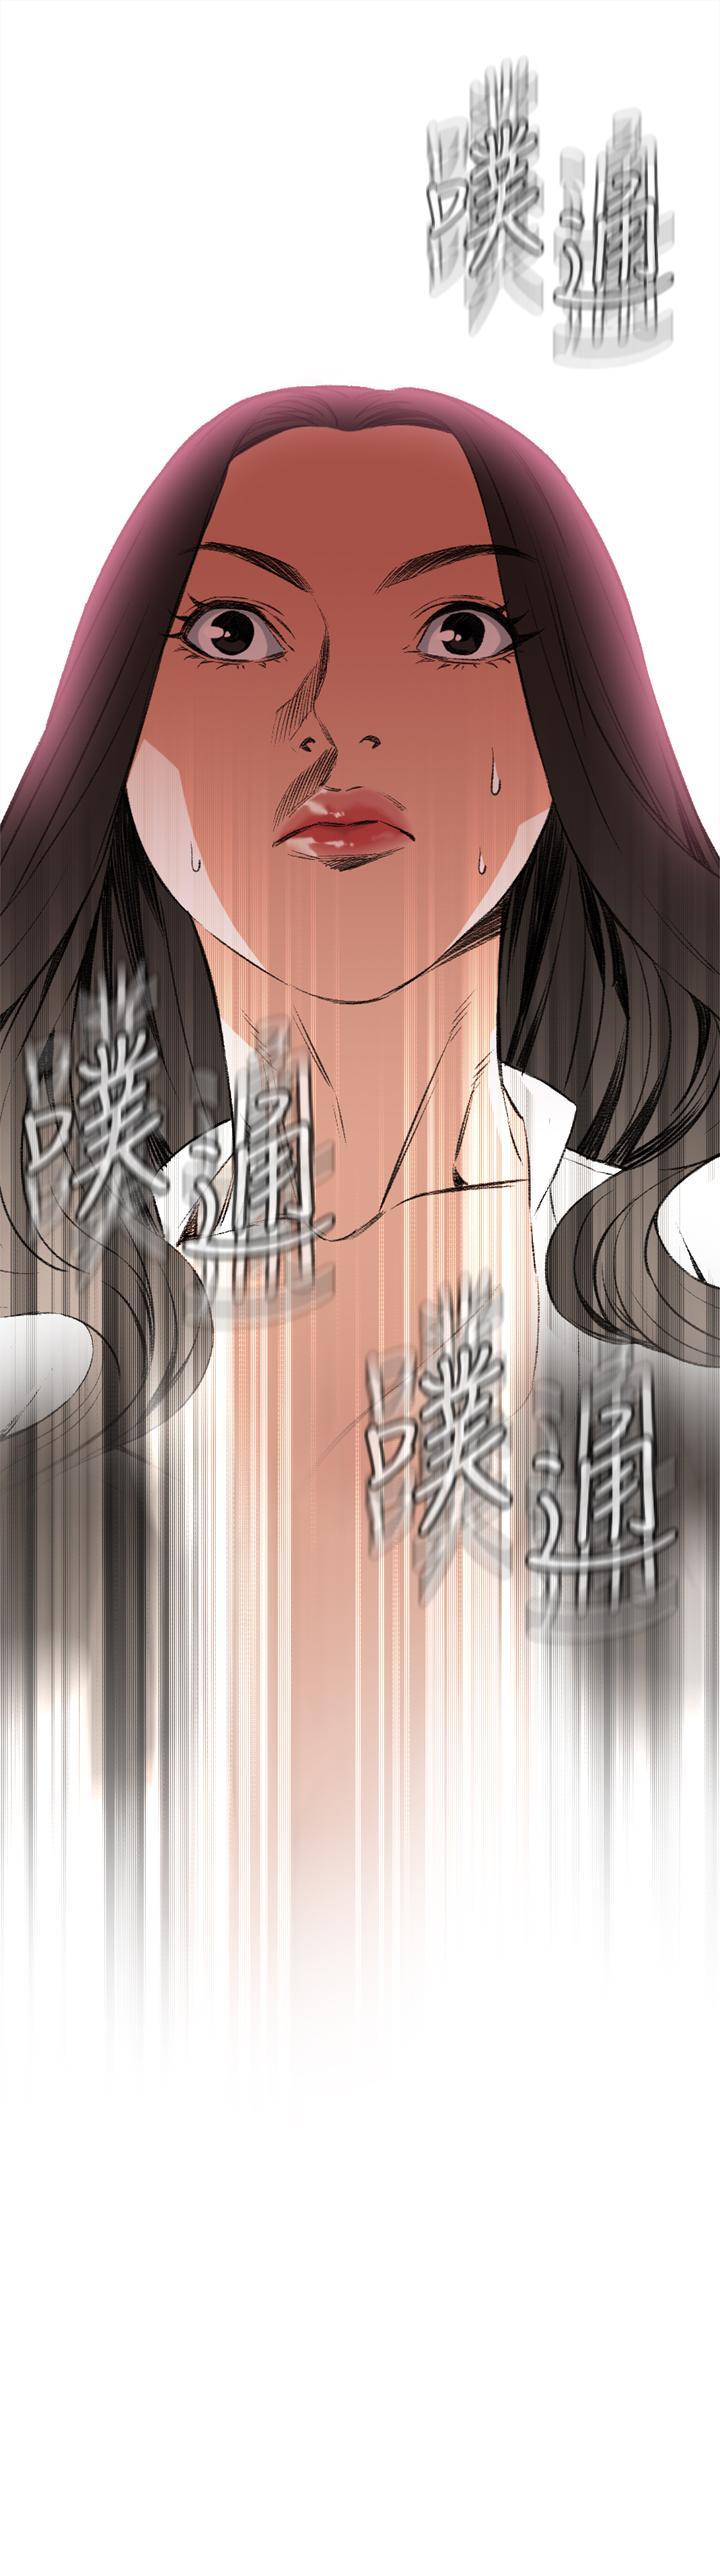 Take a Peek 偷窥 Ch.39~60 [Chinese]中文 256